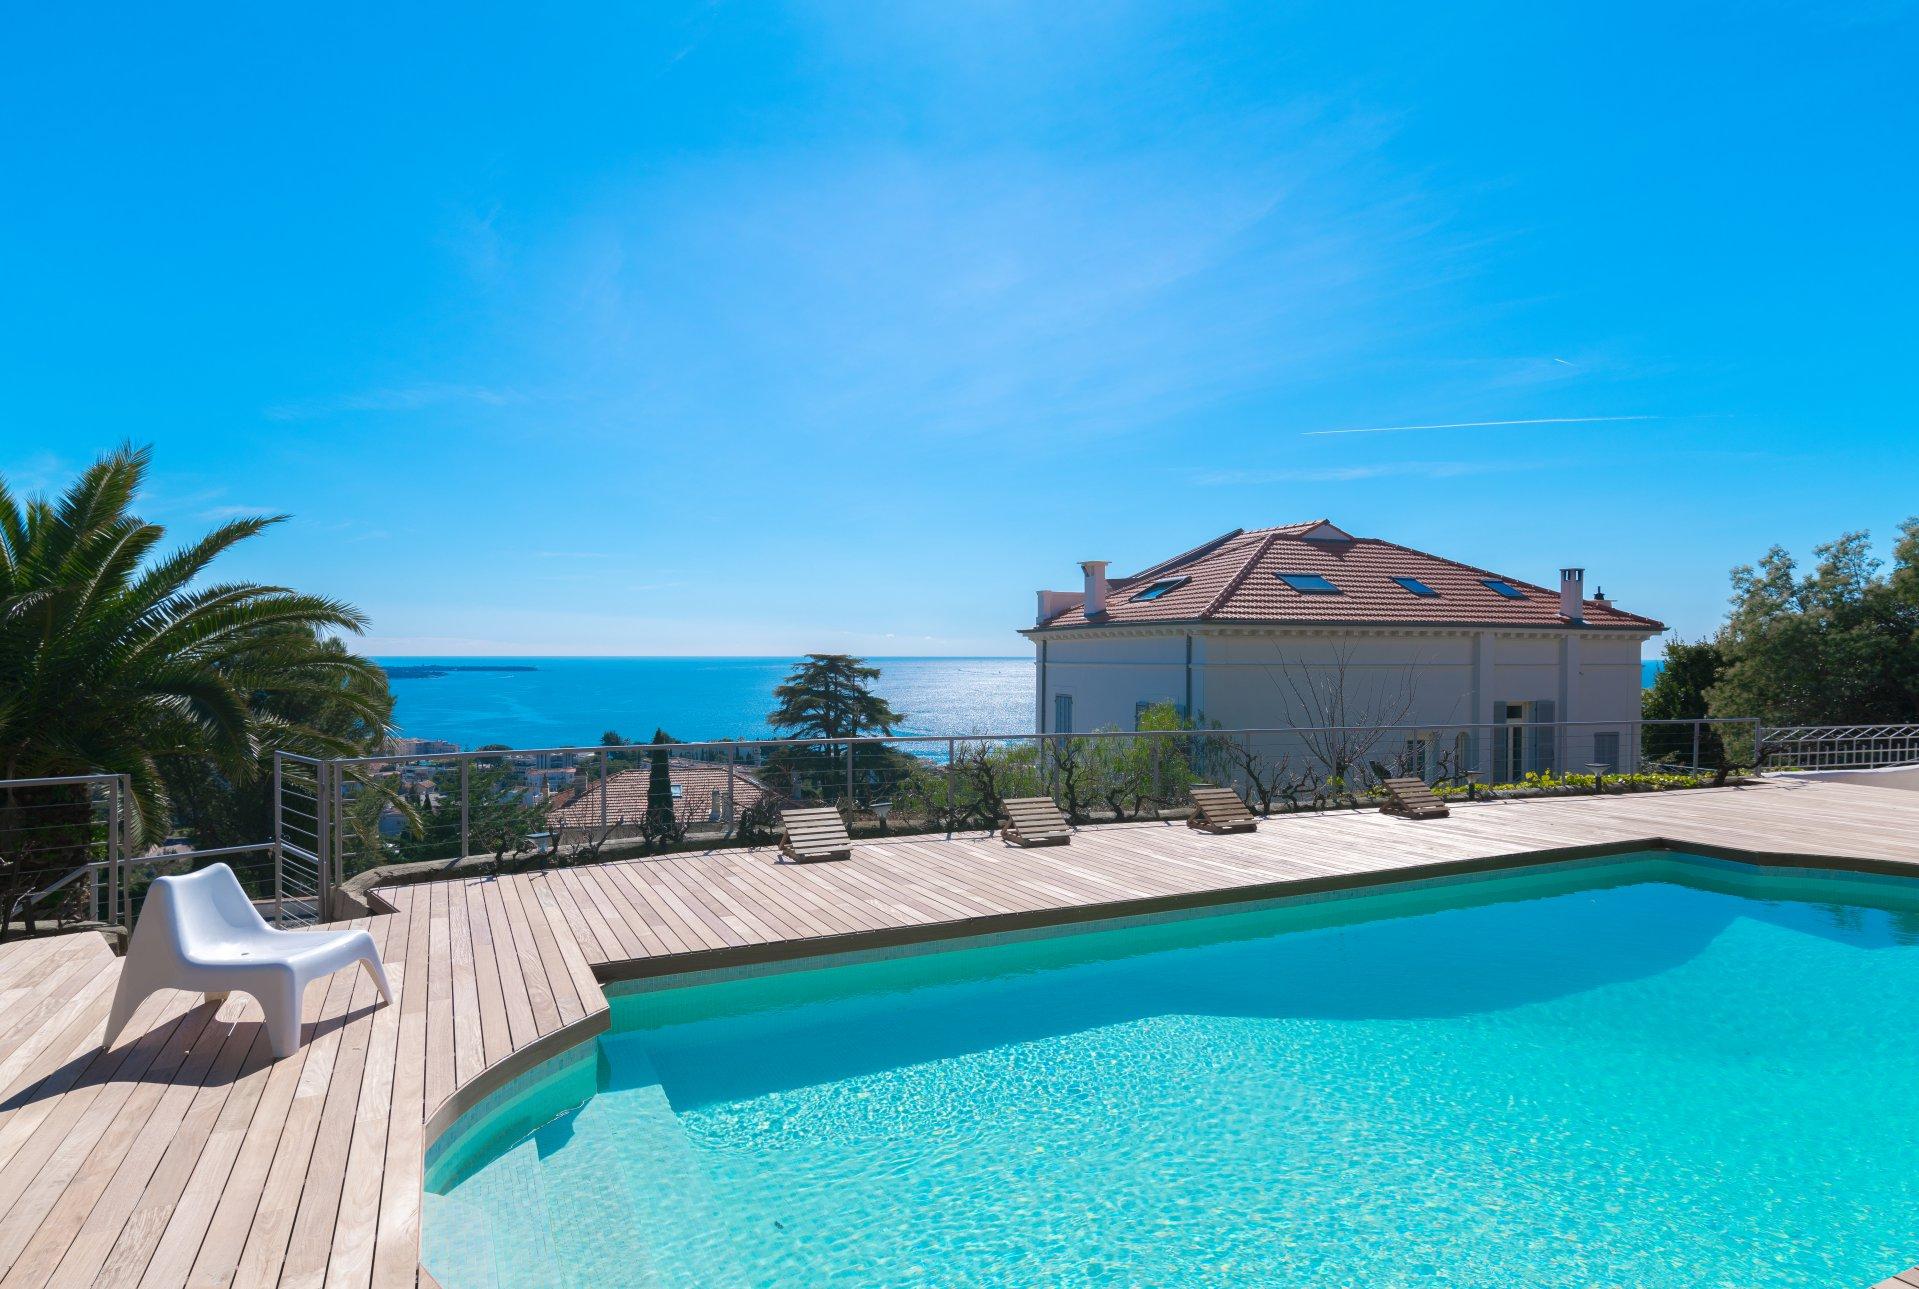 Försäljning Disponentvilla - Cannes Croix des Gardes